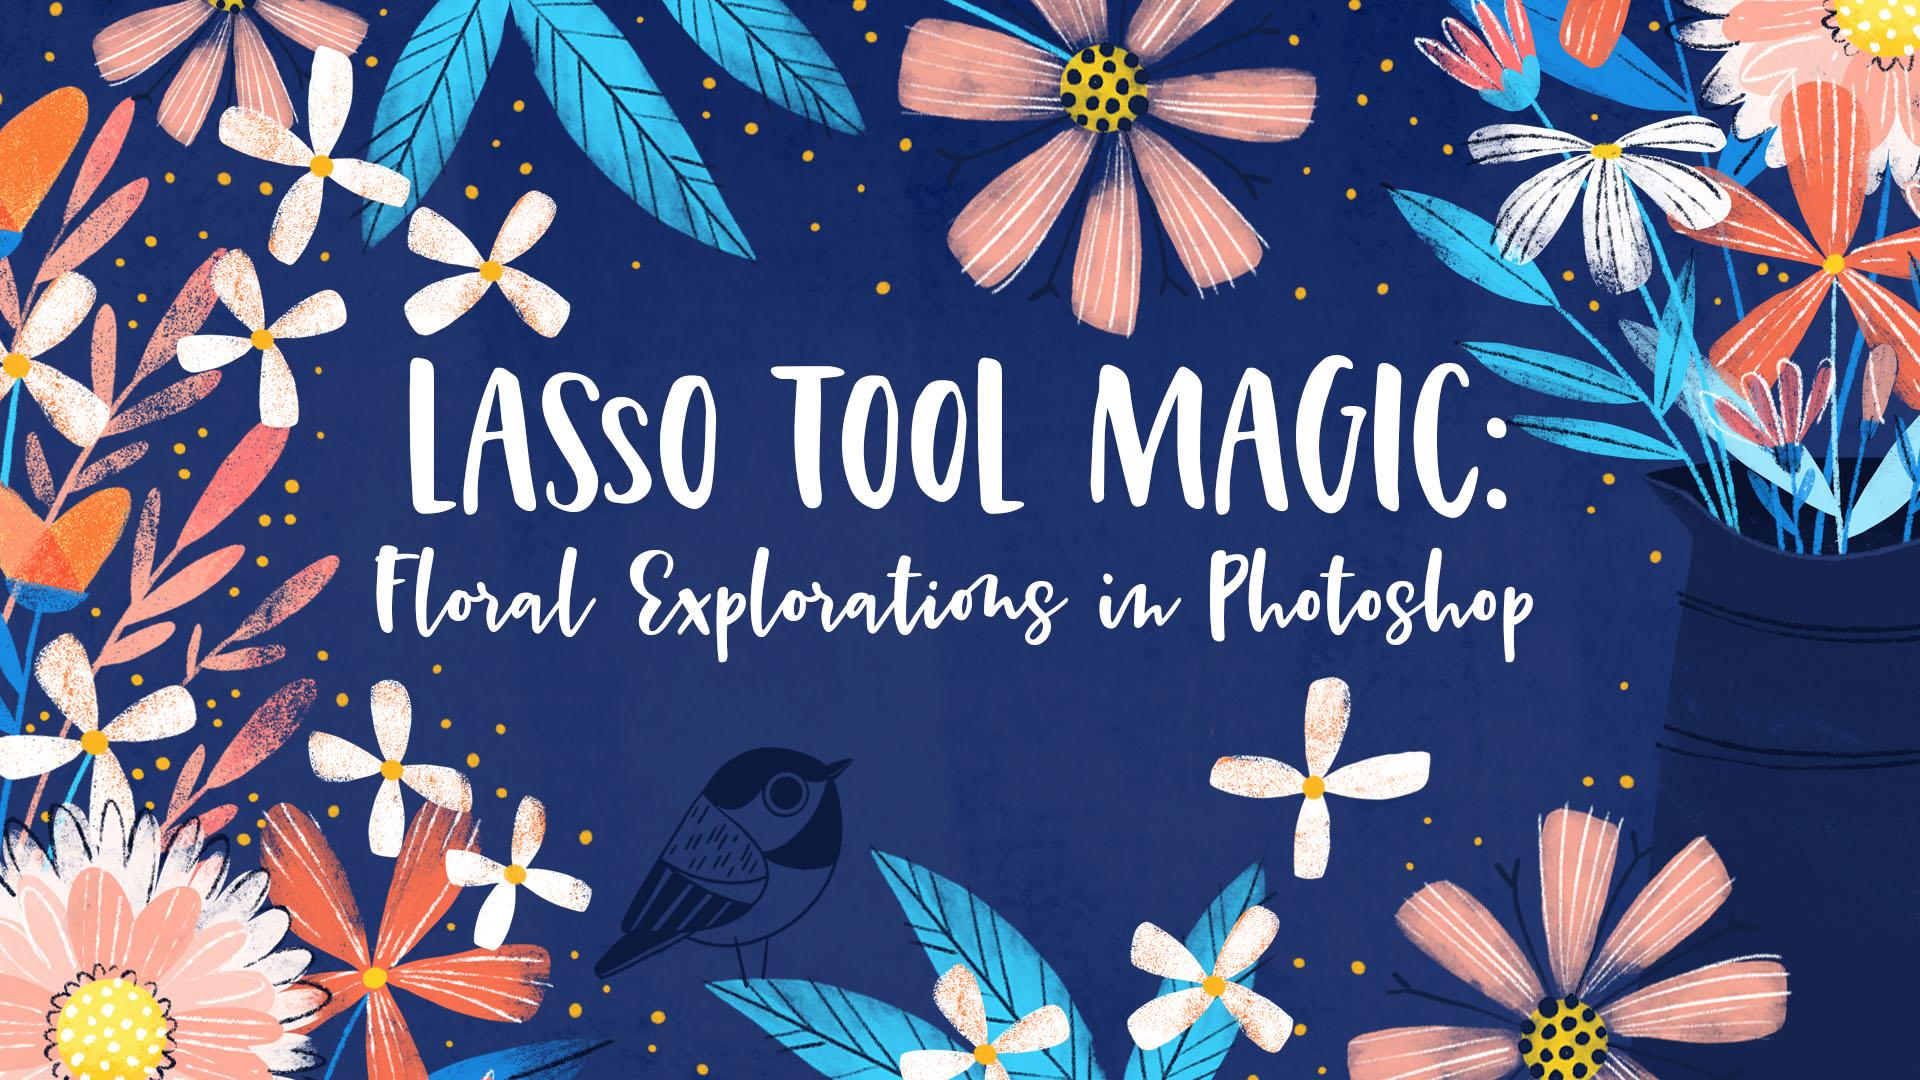 lasso tool magic.jpg